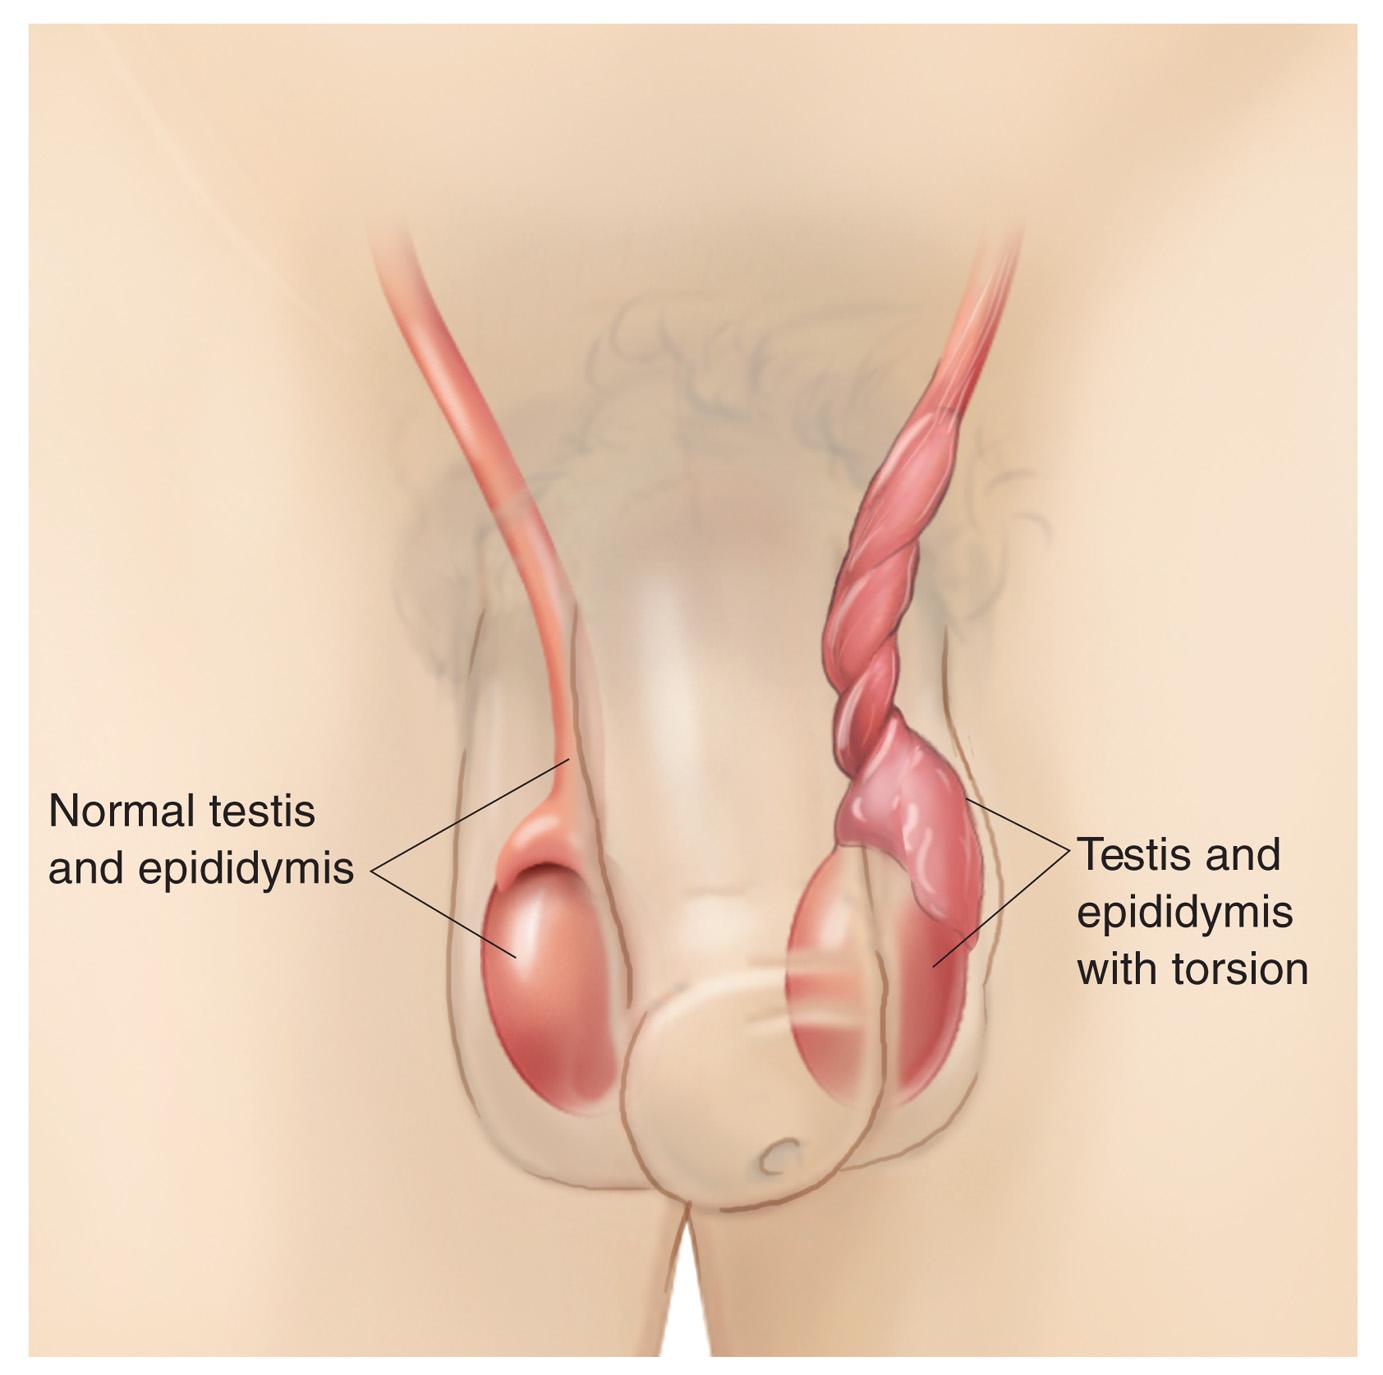 Testicular Torsion - more info